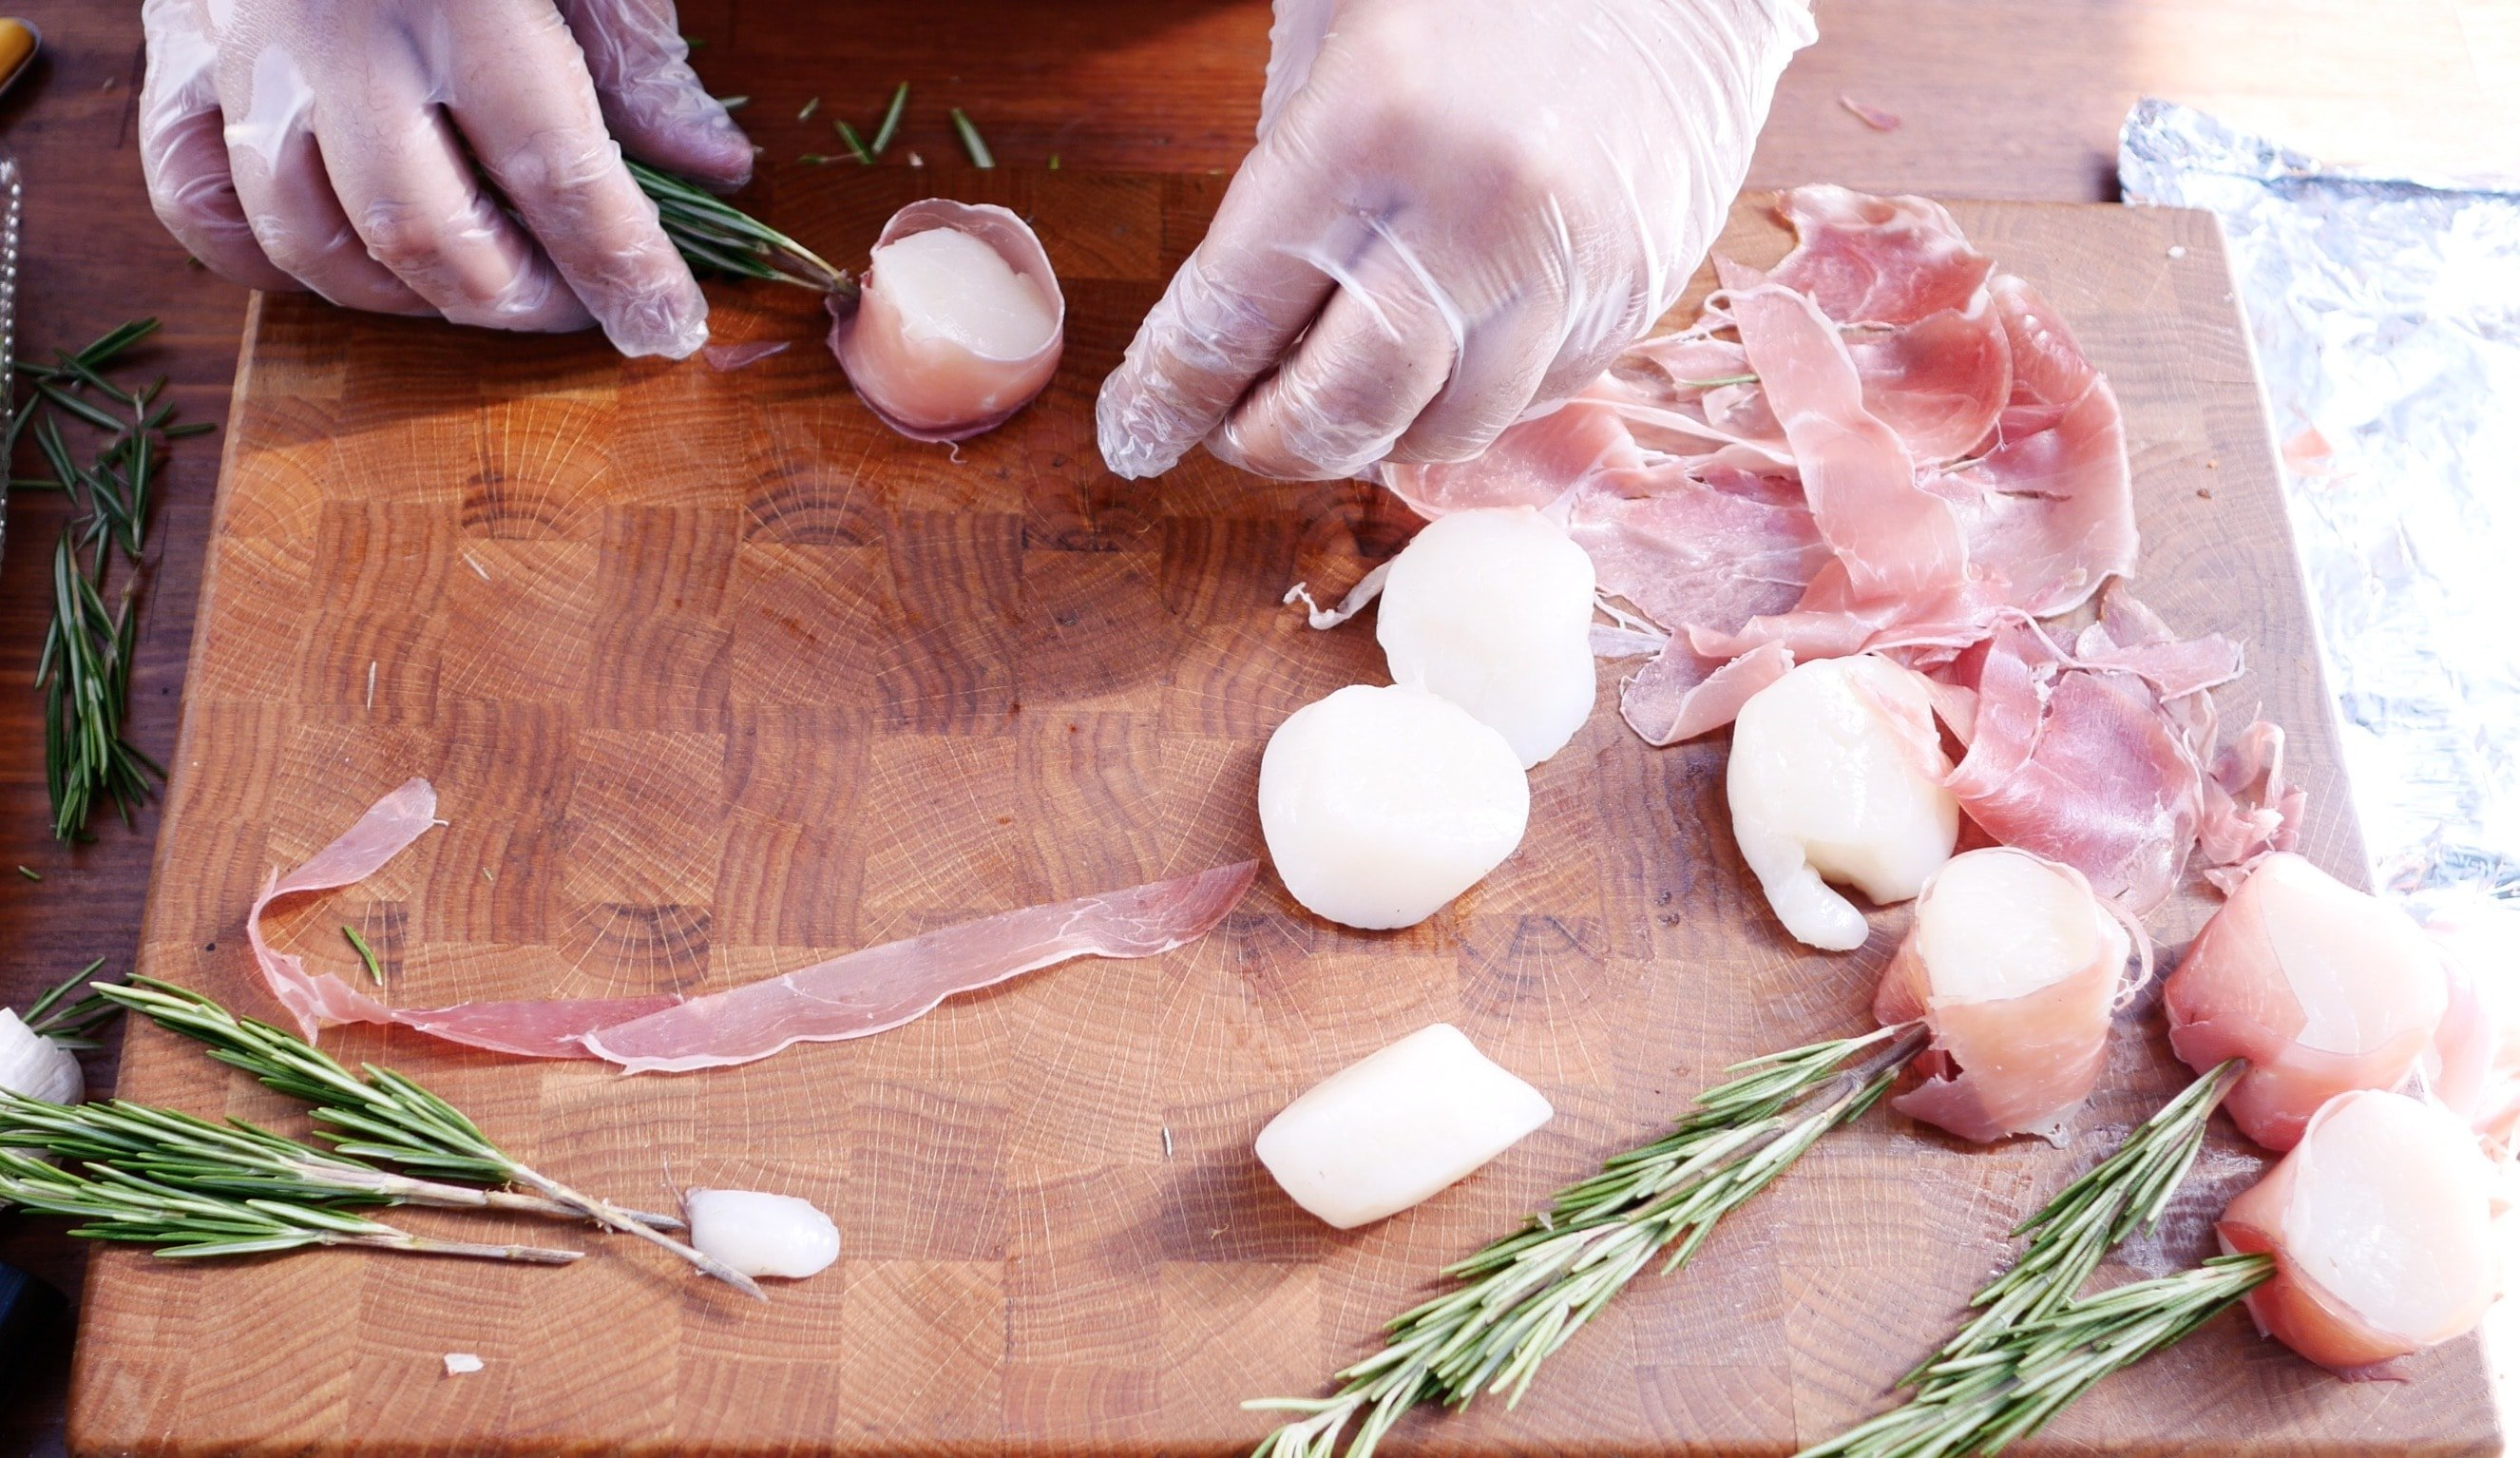 Закрелпляем мясо веткой розмарина насквозь гребешка